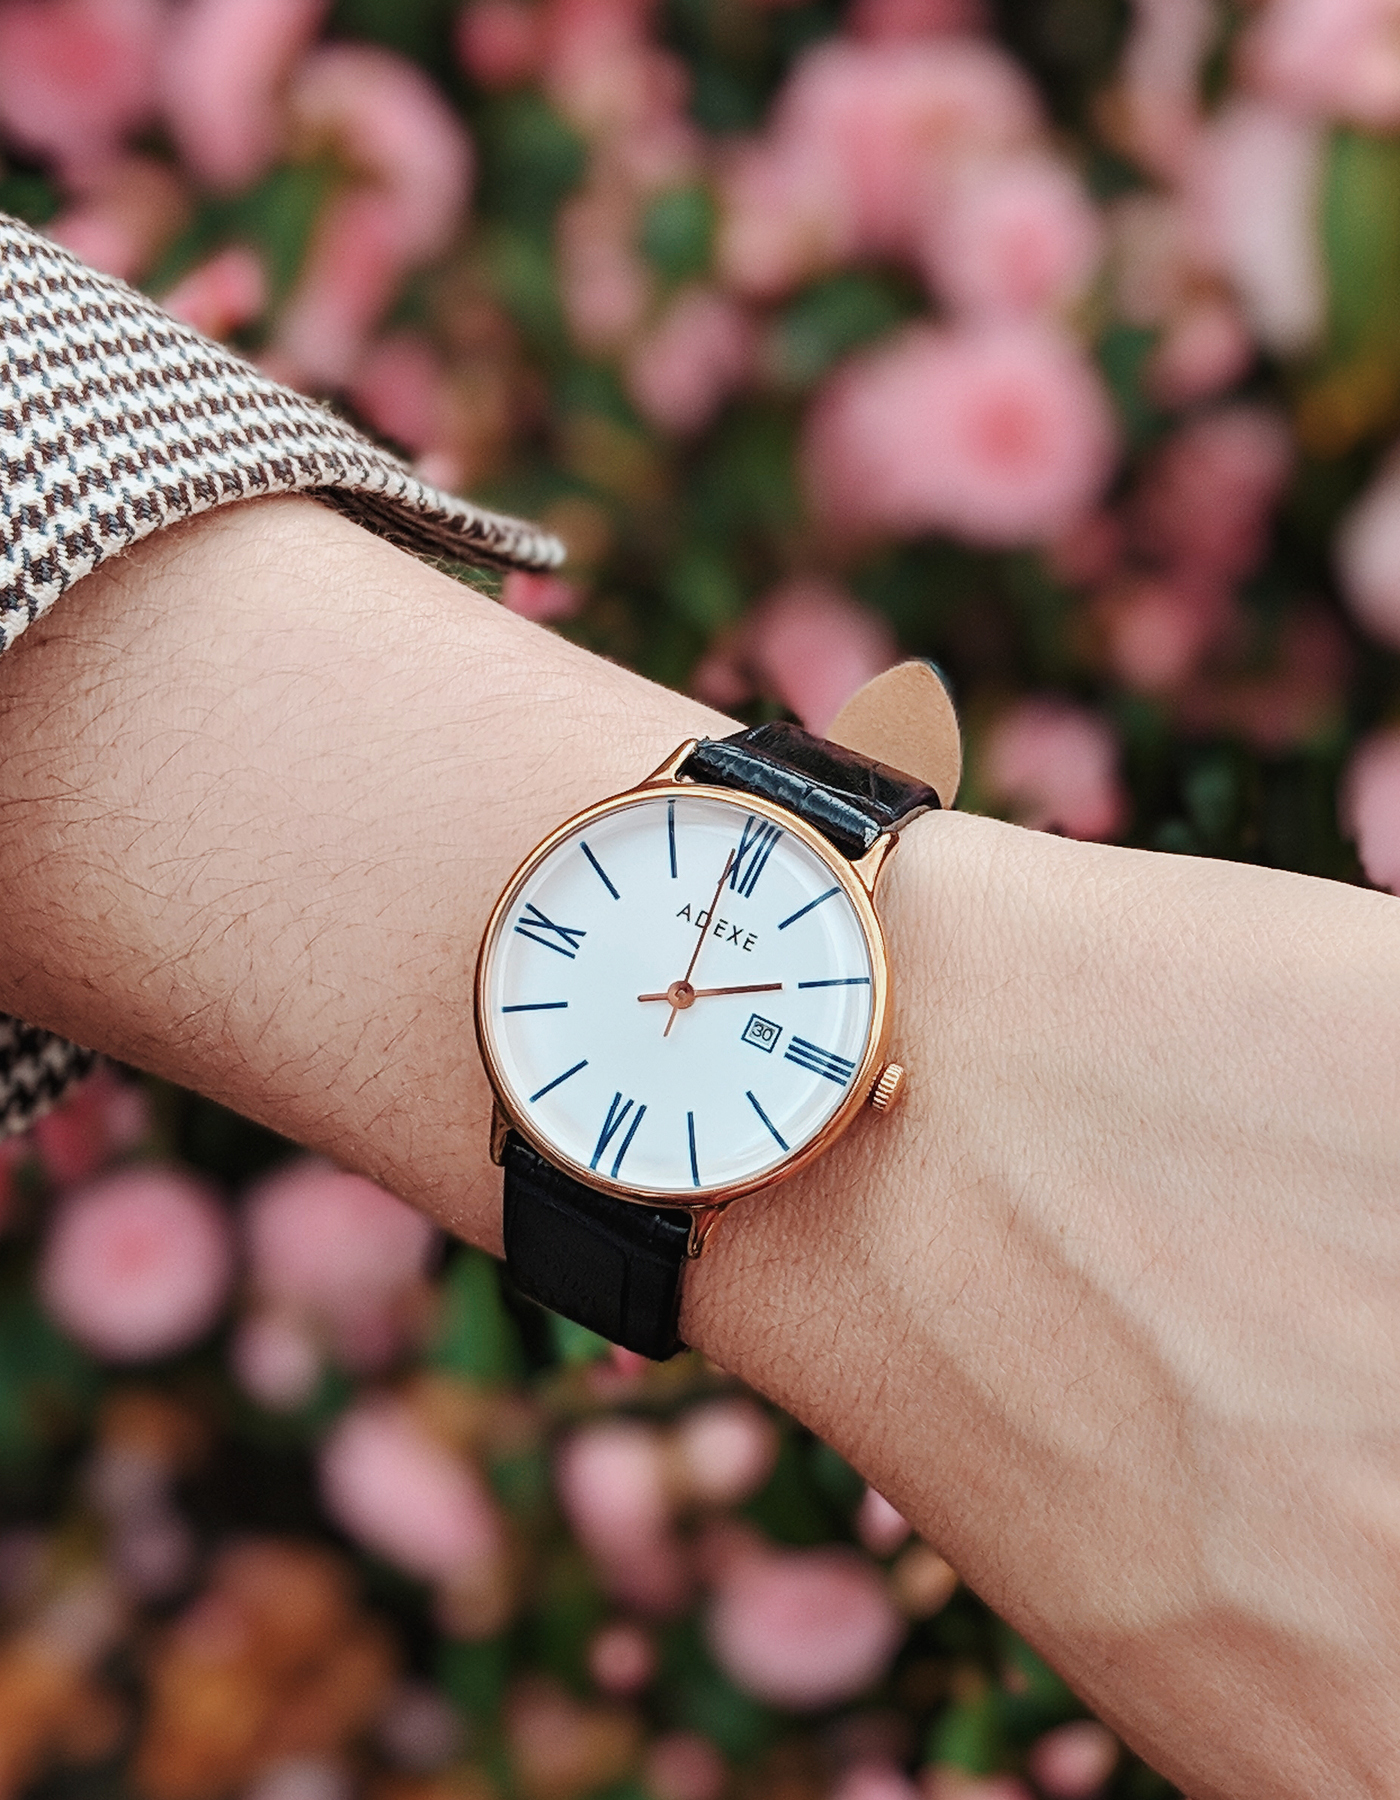 Adexe London watch